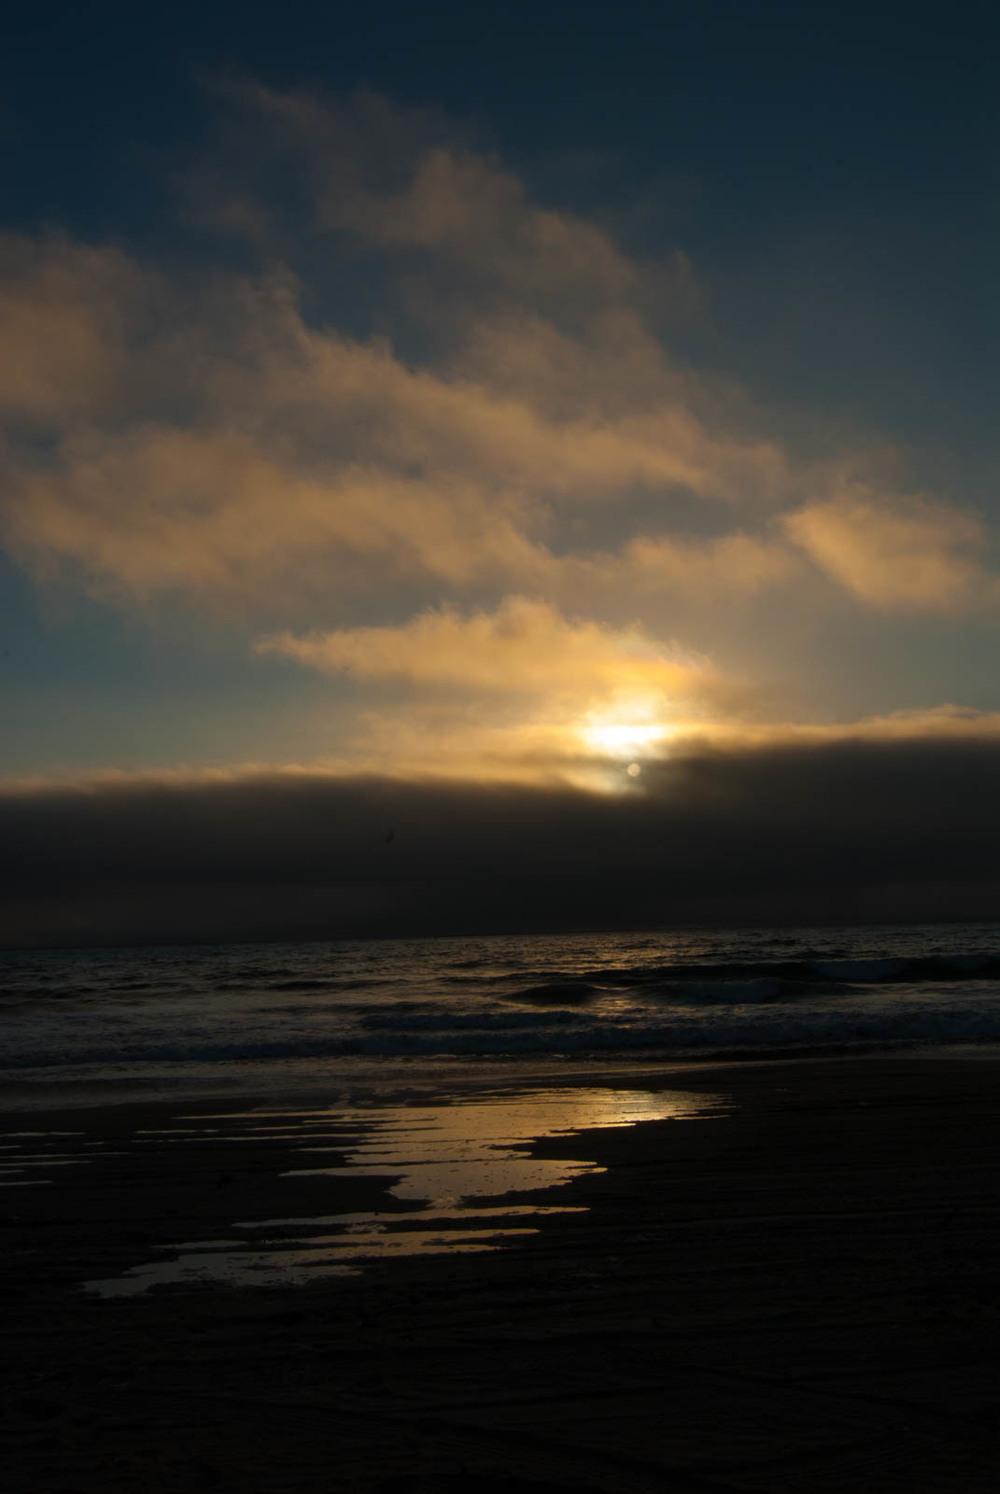 Pismo-beach_DSC_3796-2.jpg